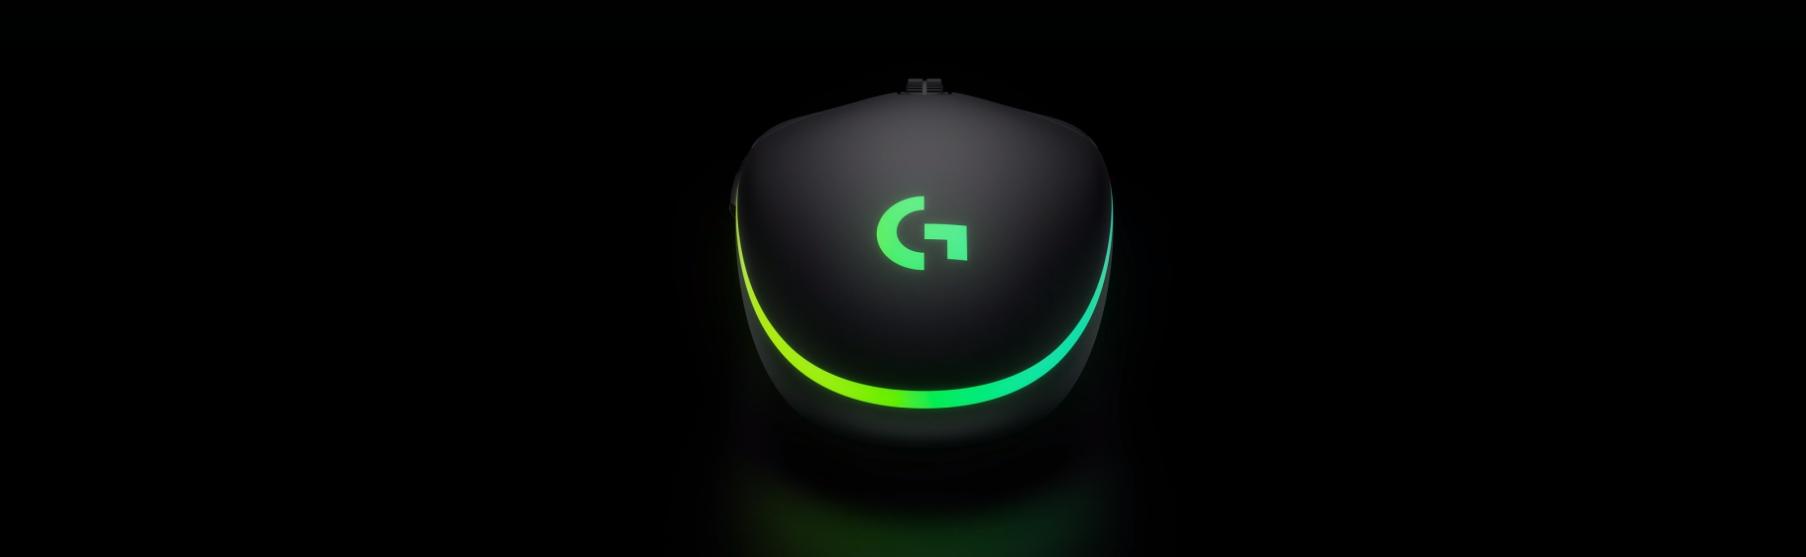 Mouse Logitech G102 Lightsync RGB White bổ sung hiệu ứng Wave cho dải led